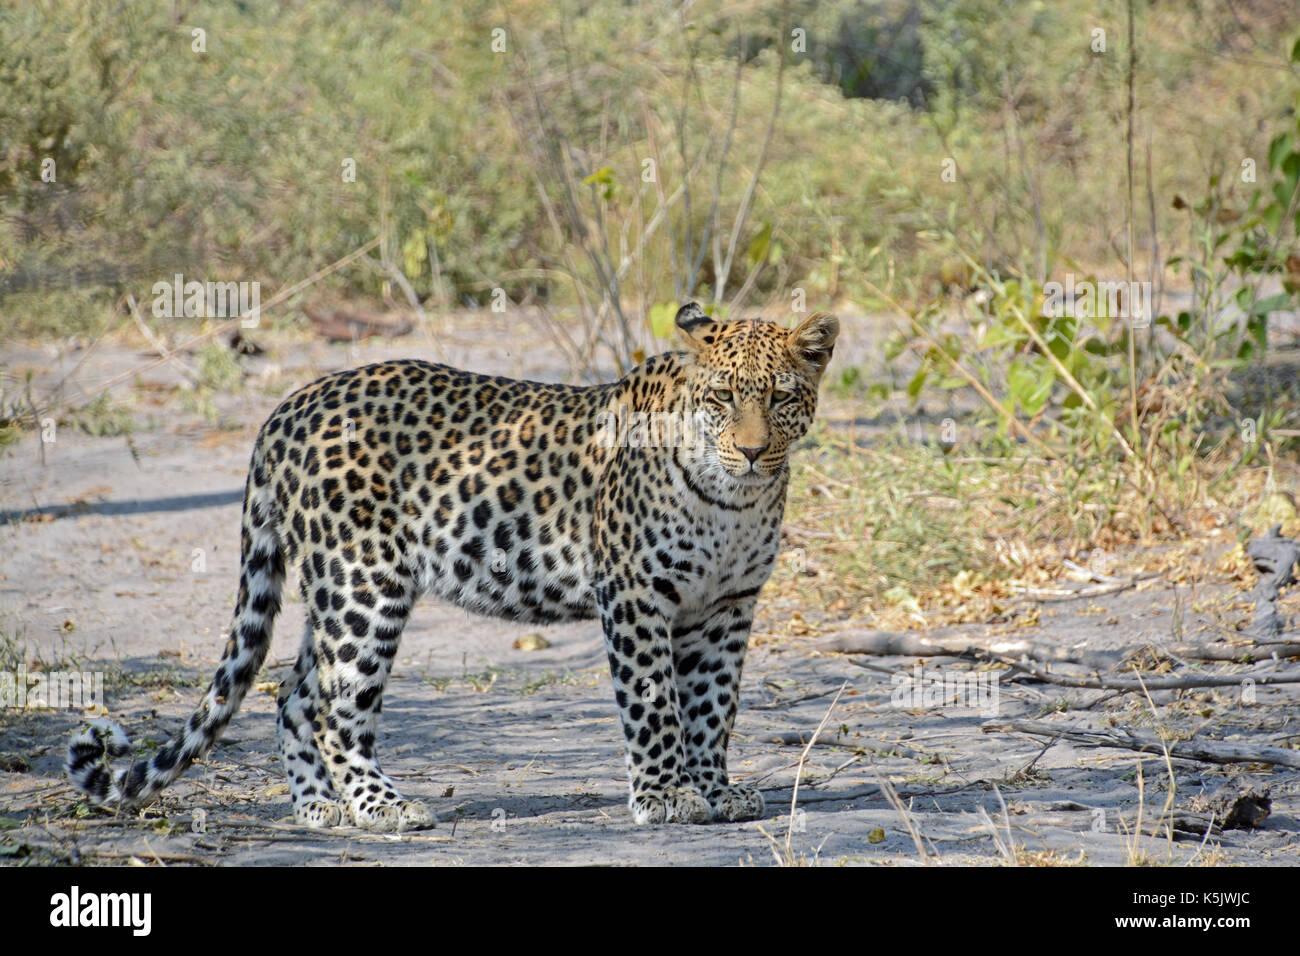 A sleepy Leopard. Taken in the Okavango Delta, Botswana - Stock Image